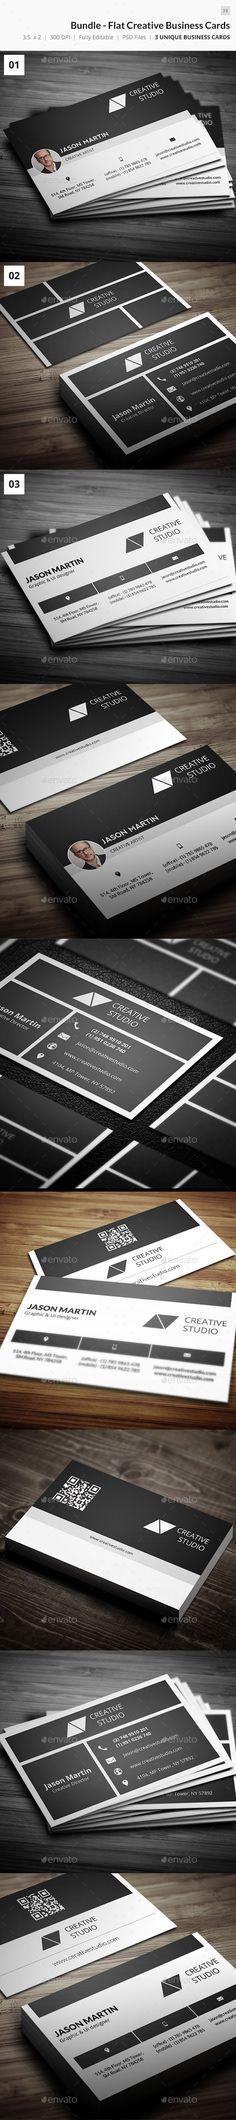 Bundle - Creative Flat Business Cards - 39